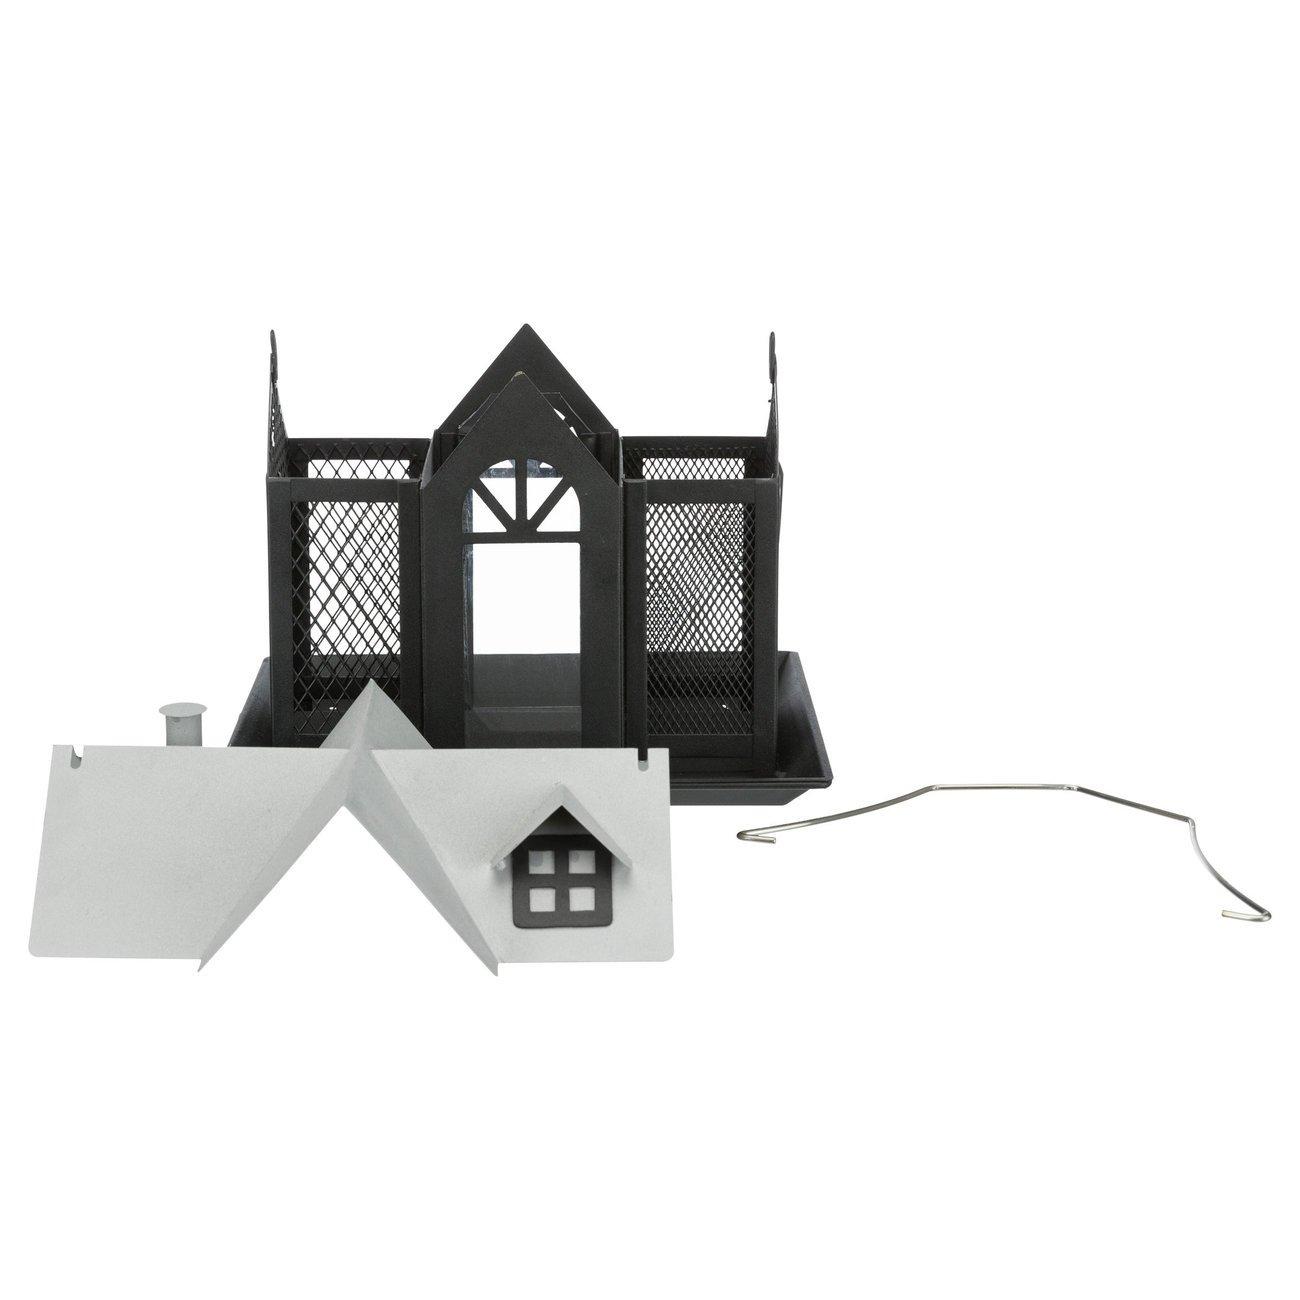 Trixie Futterhaus Villa 55410, Bild 5